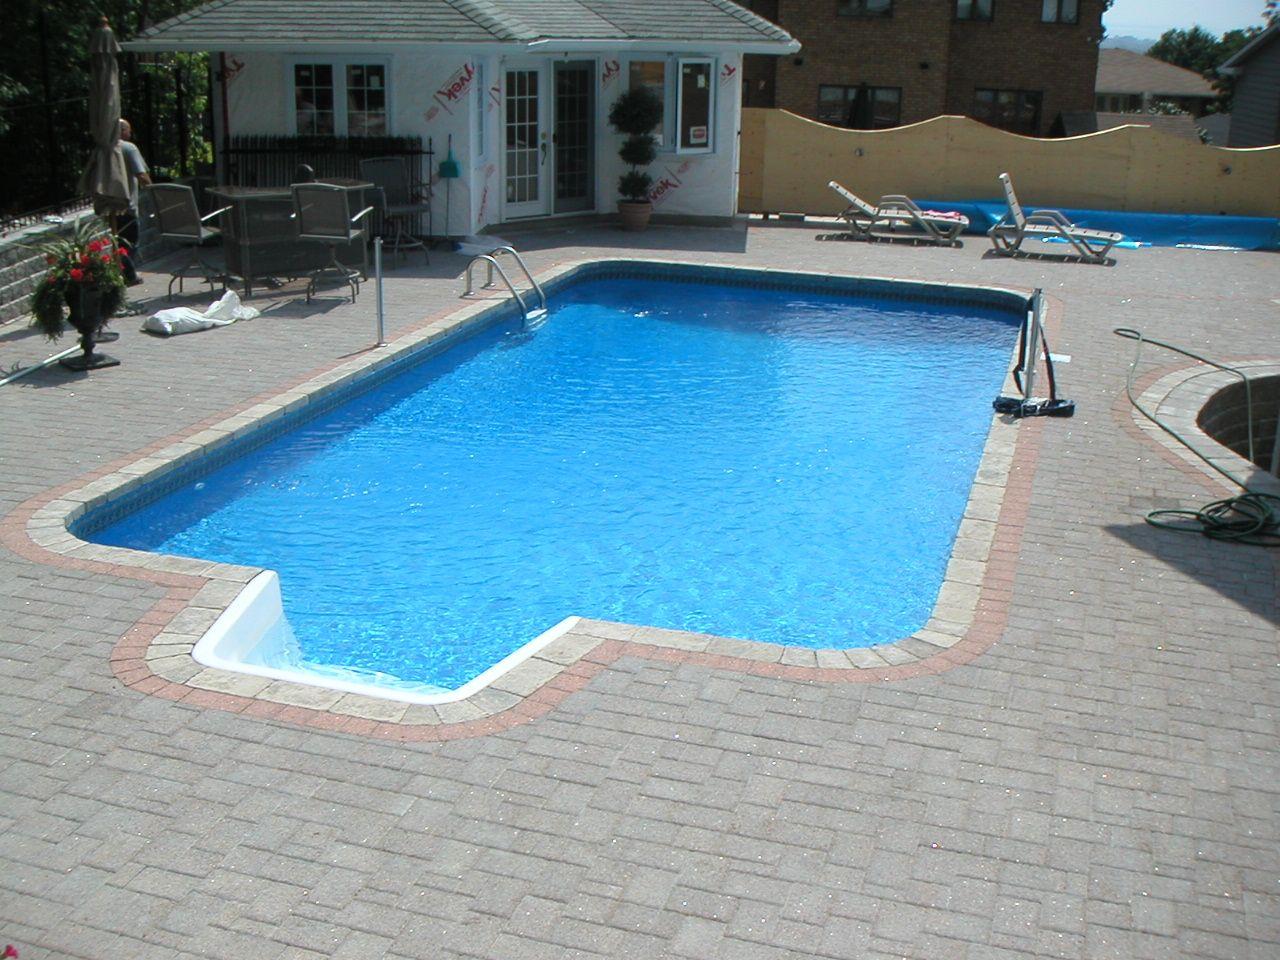 16x32 Rectangle With 2 Foot Radius Corners Swimming